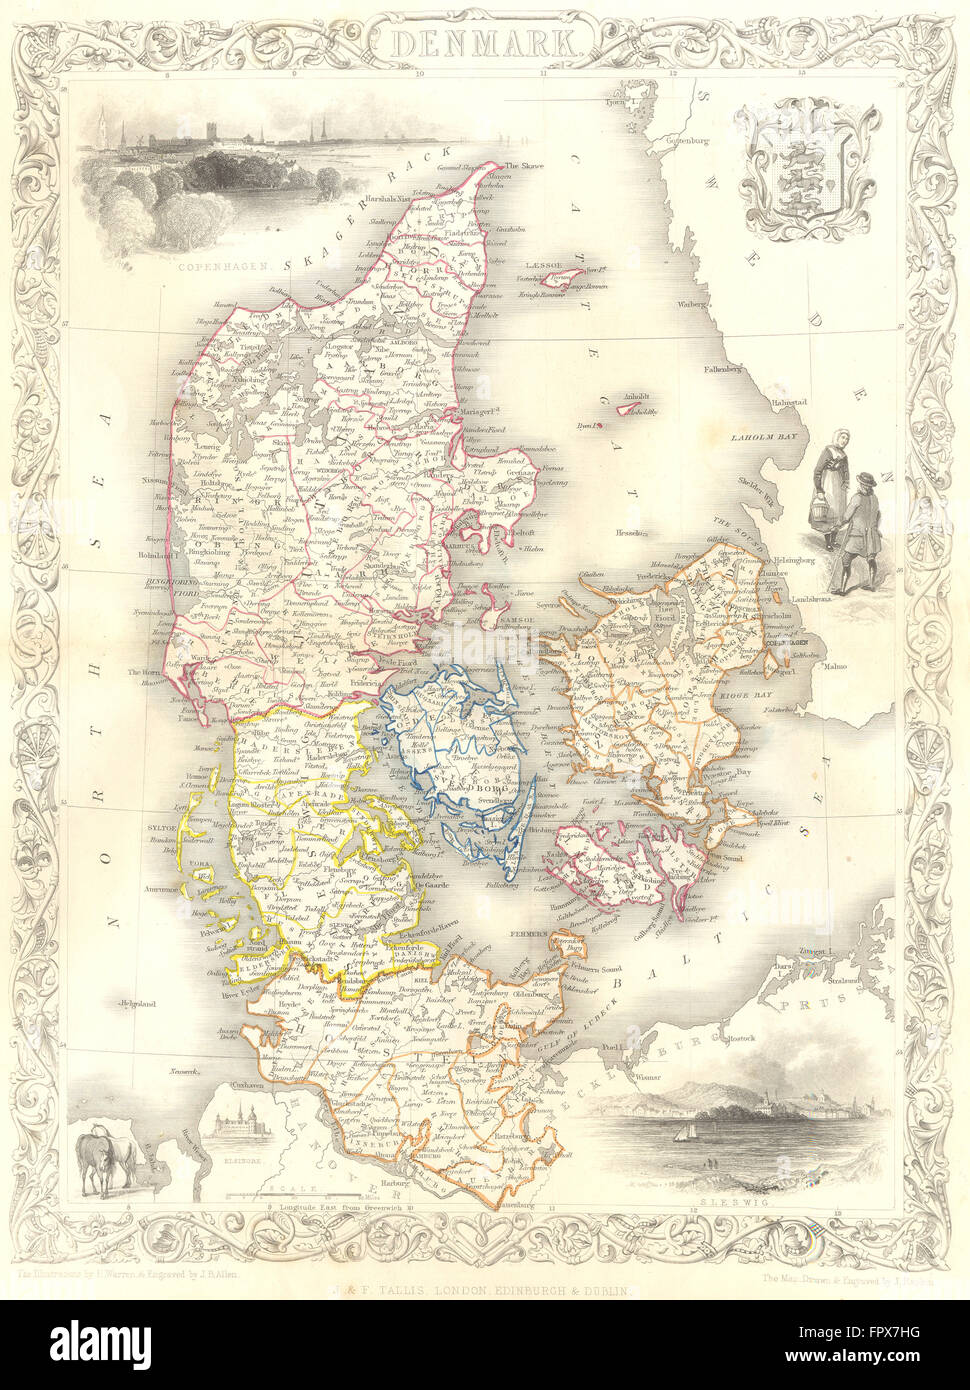 DENMARK: Tallis, 1855 antique map - Stock Image